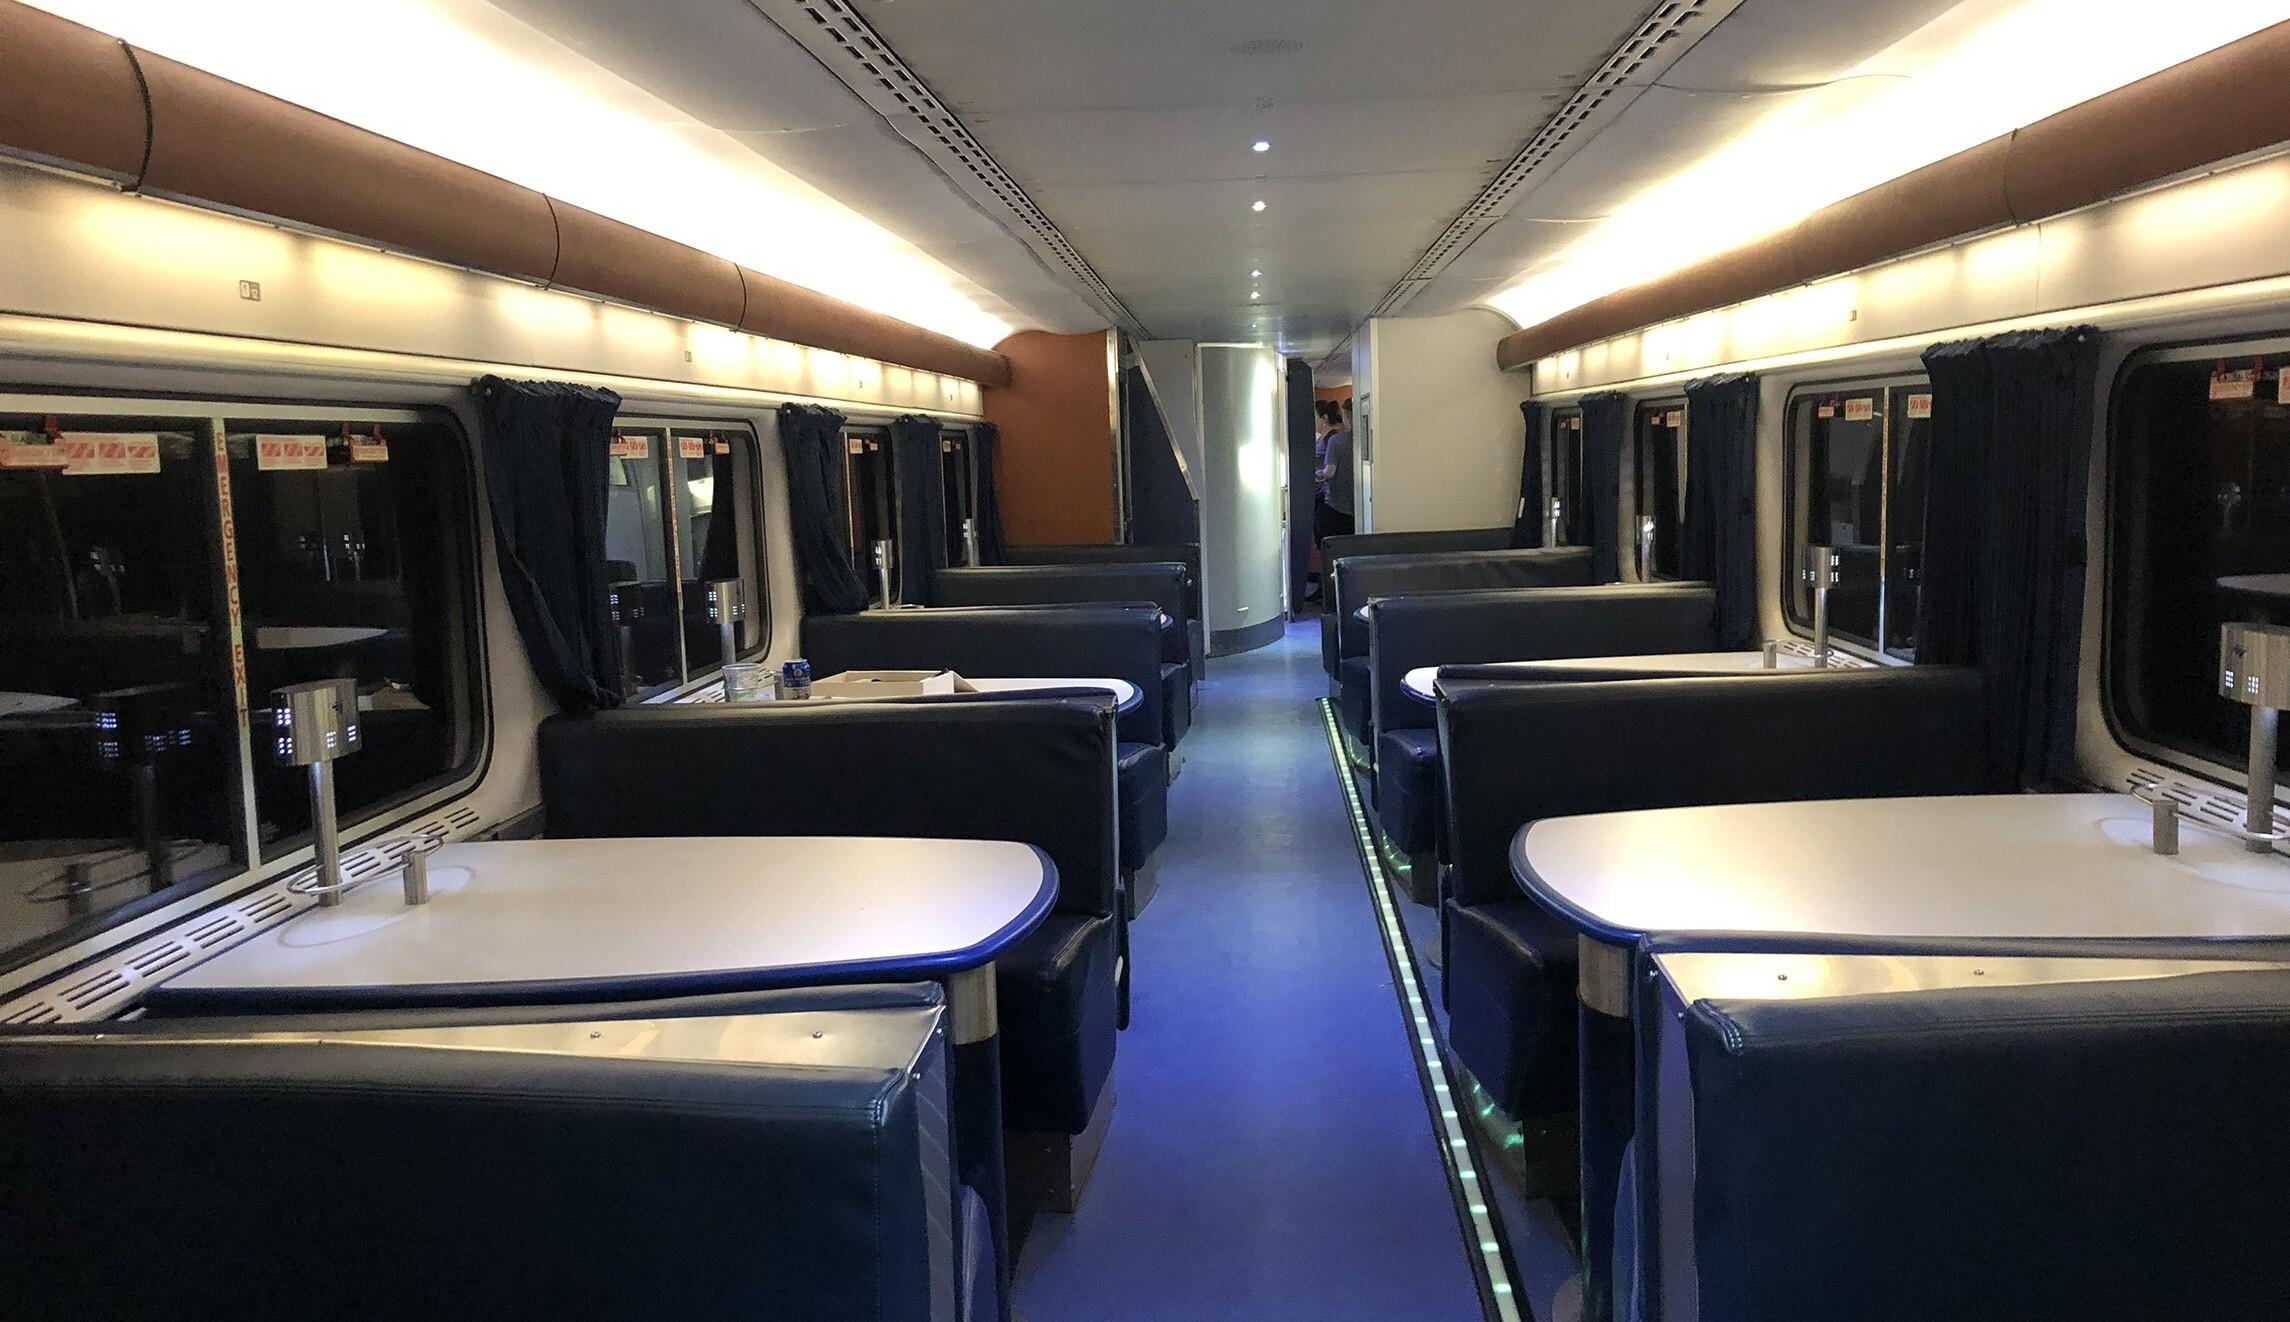 Amtrak forgot trains aren't planes